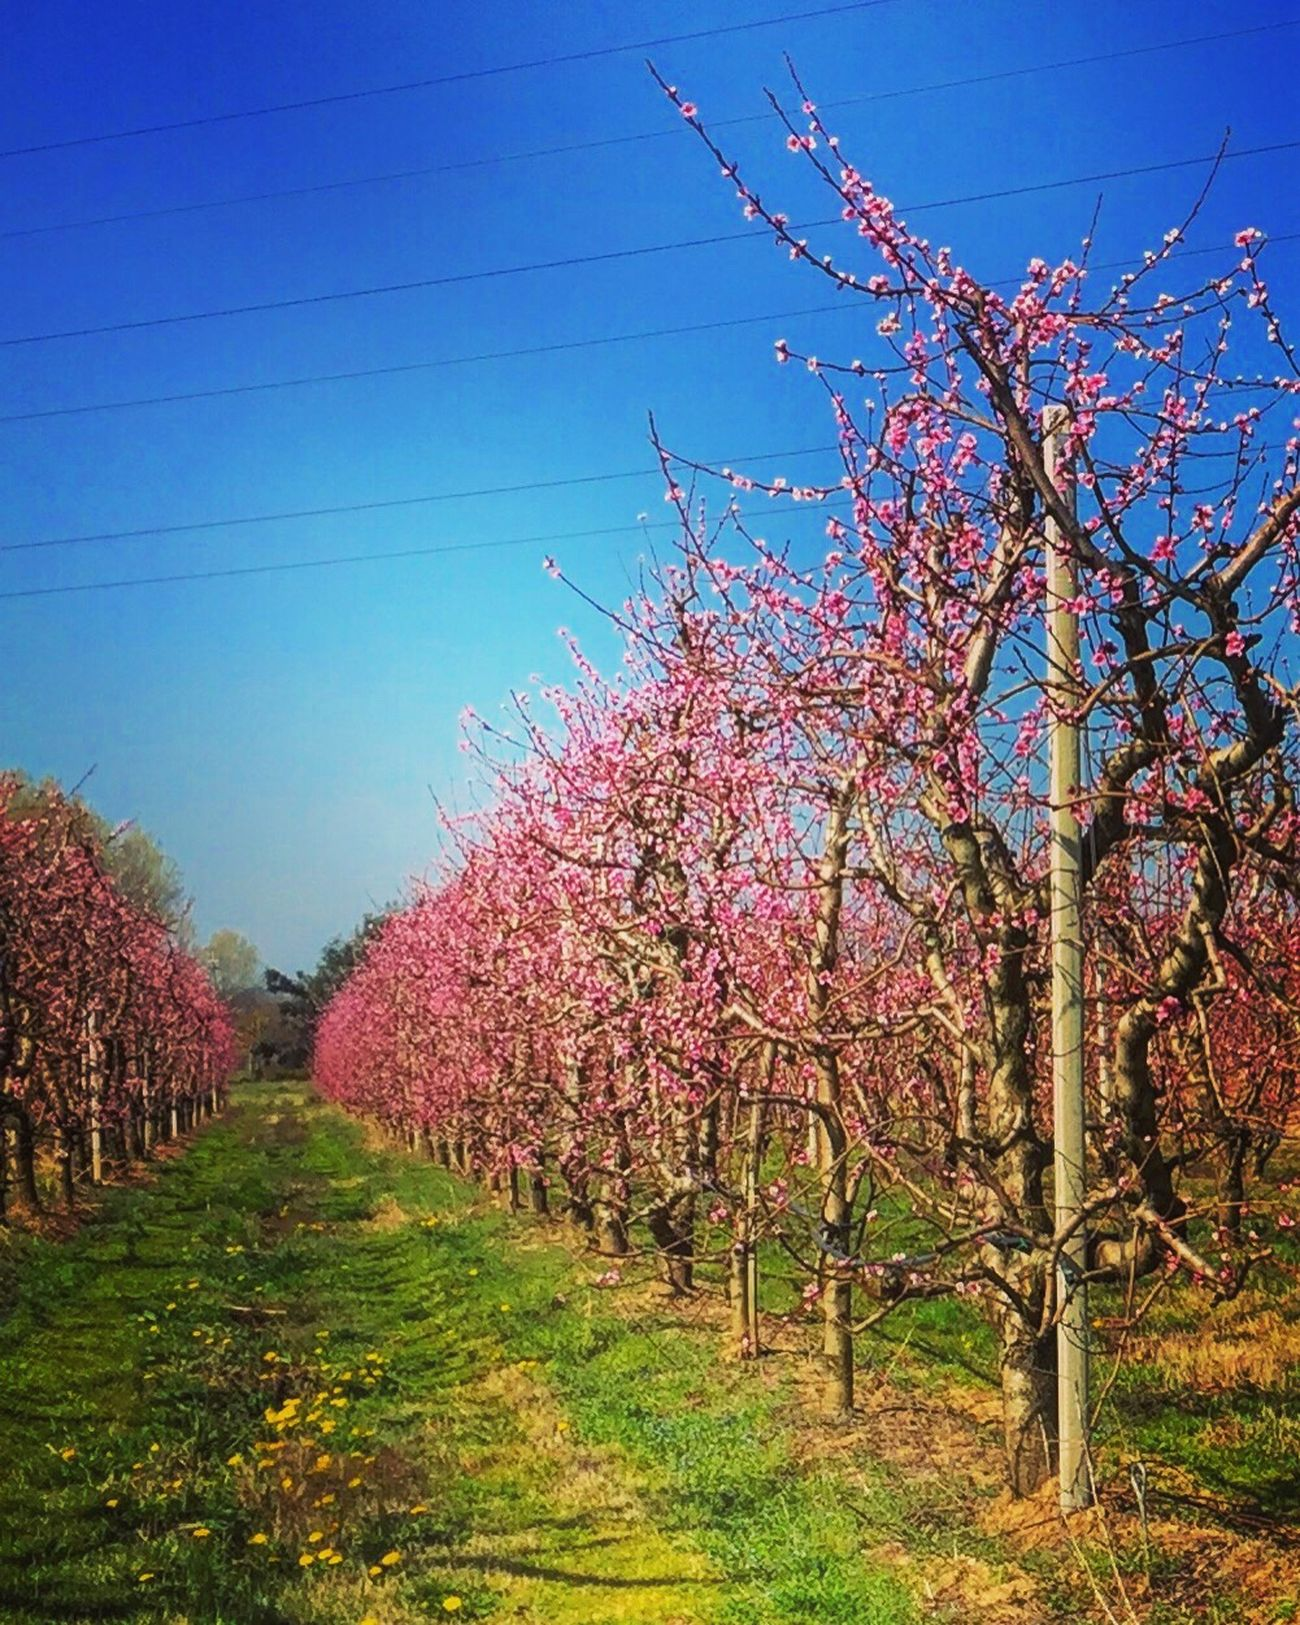 Fiori Fioritura Flower Flowers Spring Primavera Spring Flowers Rosa Pink Color Pink Frutta Fruit Scents Tuscany Toscana Italy Italia Igers Igersitalia Igerstoscana Igersarezzo Volgo Volgoitalia Volgotoscana Volgoarezzo